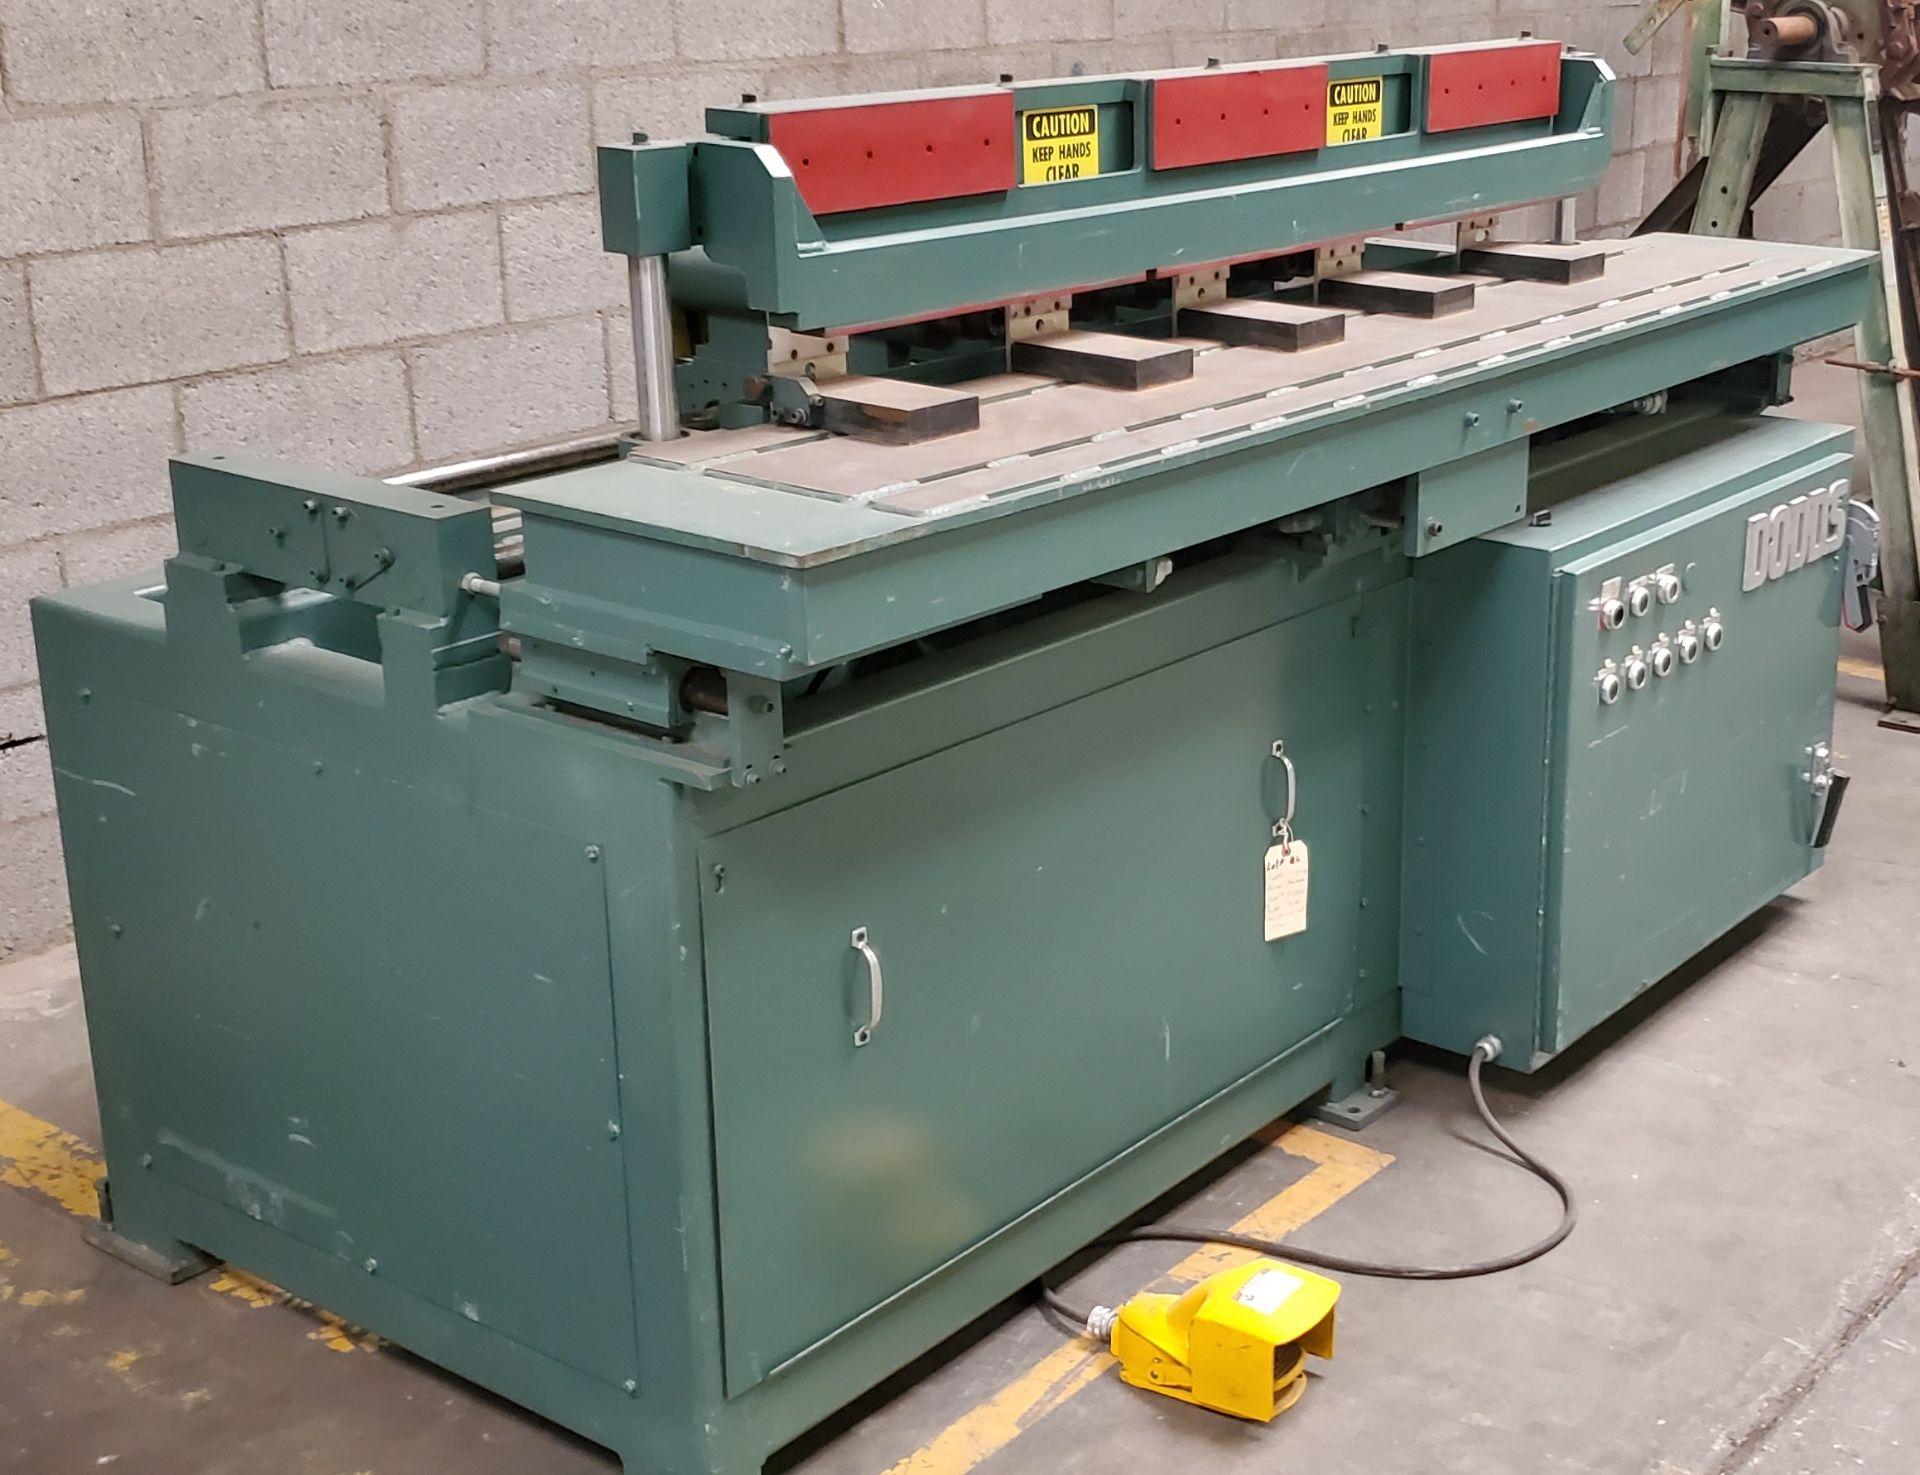 Dodds 5-Spindle Boring Machine, Model: B-802 Baldor 1.5HP 208-230/460 Volts (5 Motors) - Image 2 of 6